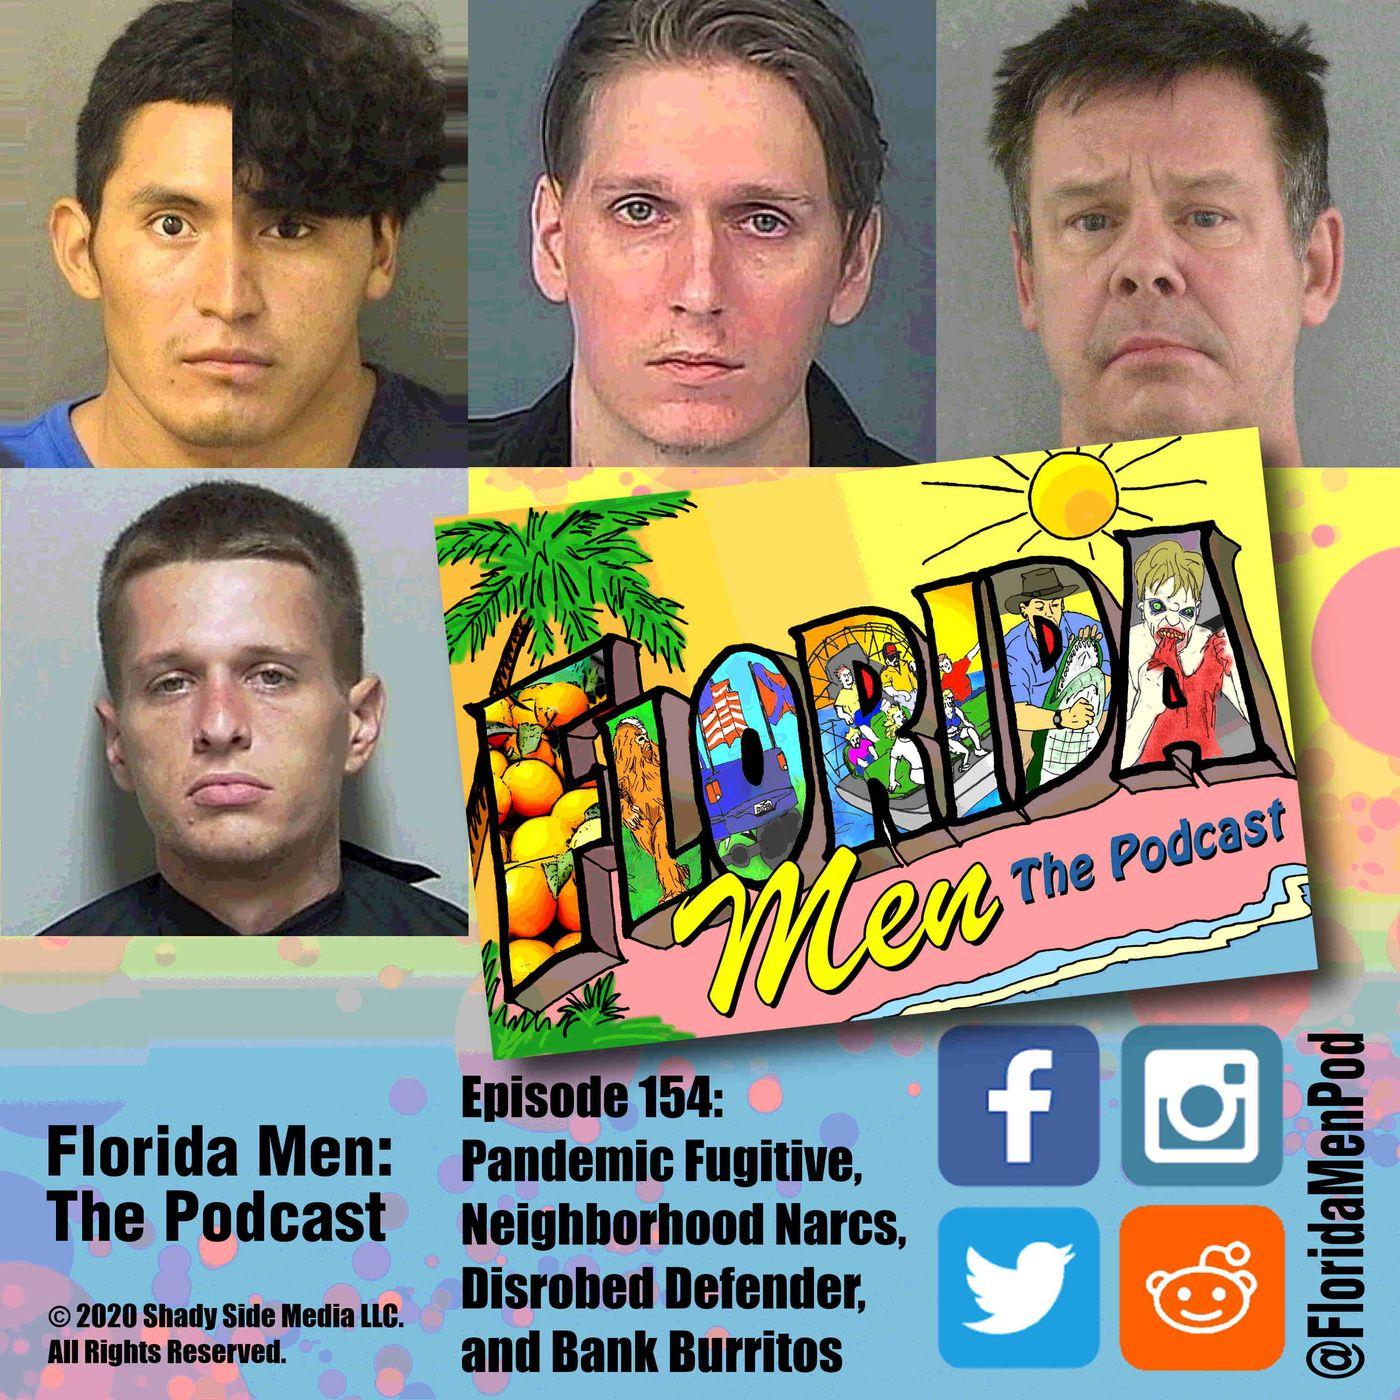 154 - Pandemic Fugitive, Neighborhood Narcs, Disrobed Defender, and Bank Burritos